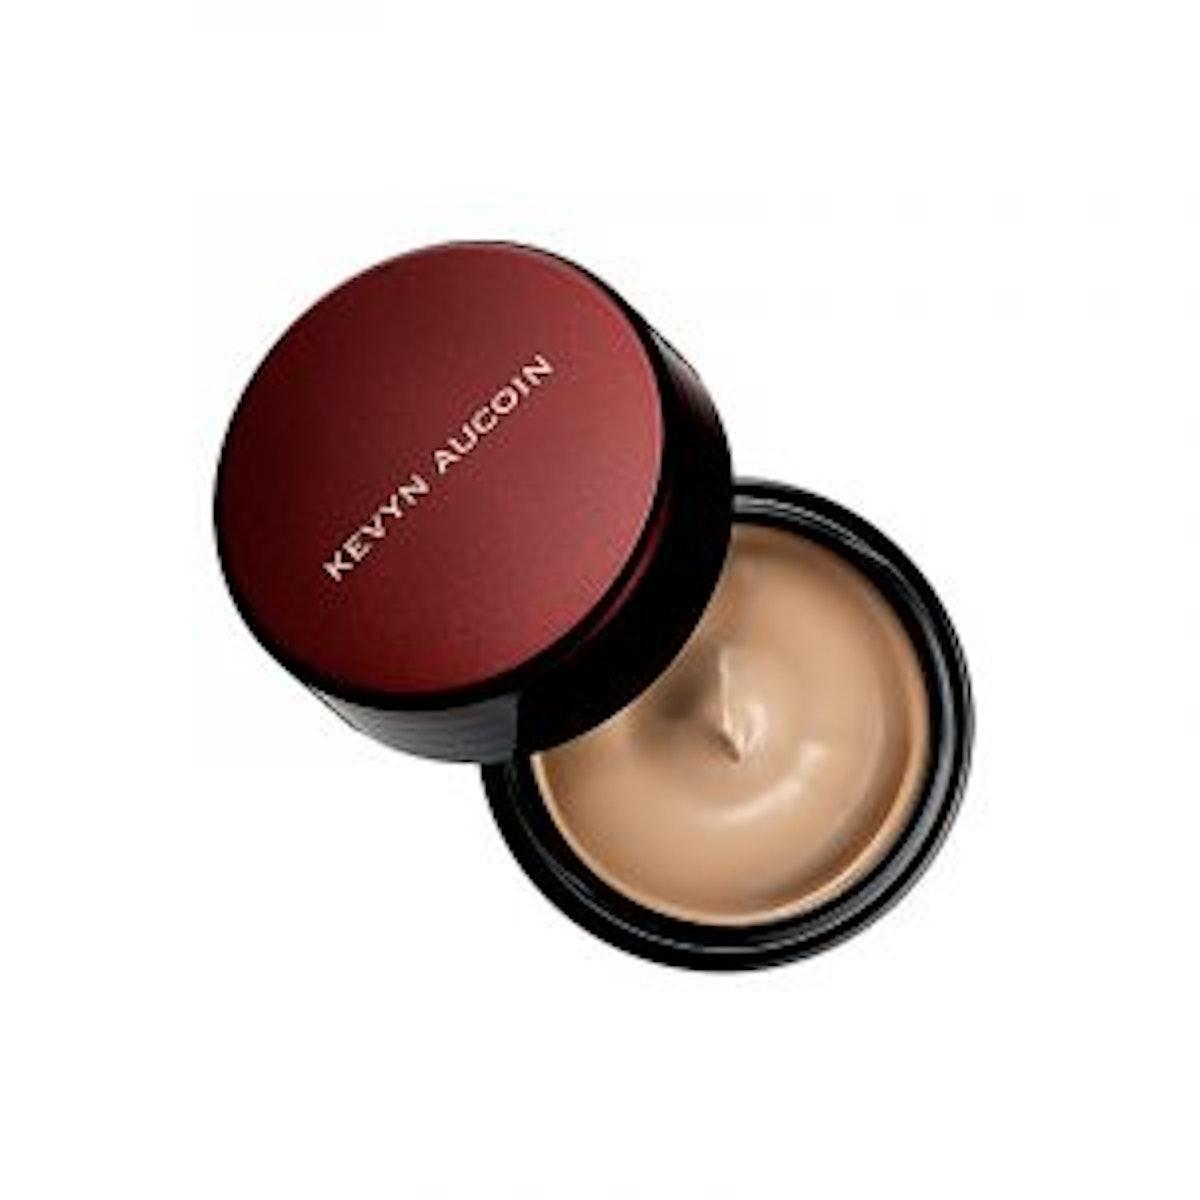 The Sensual Skin Enhancer Concealer And Foundation